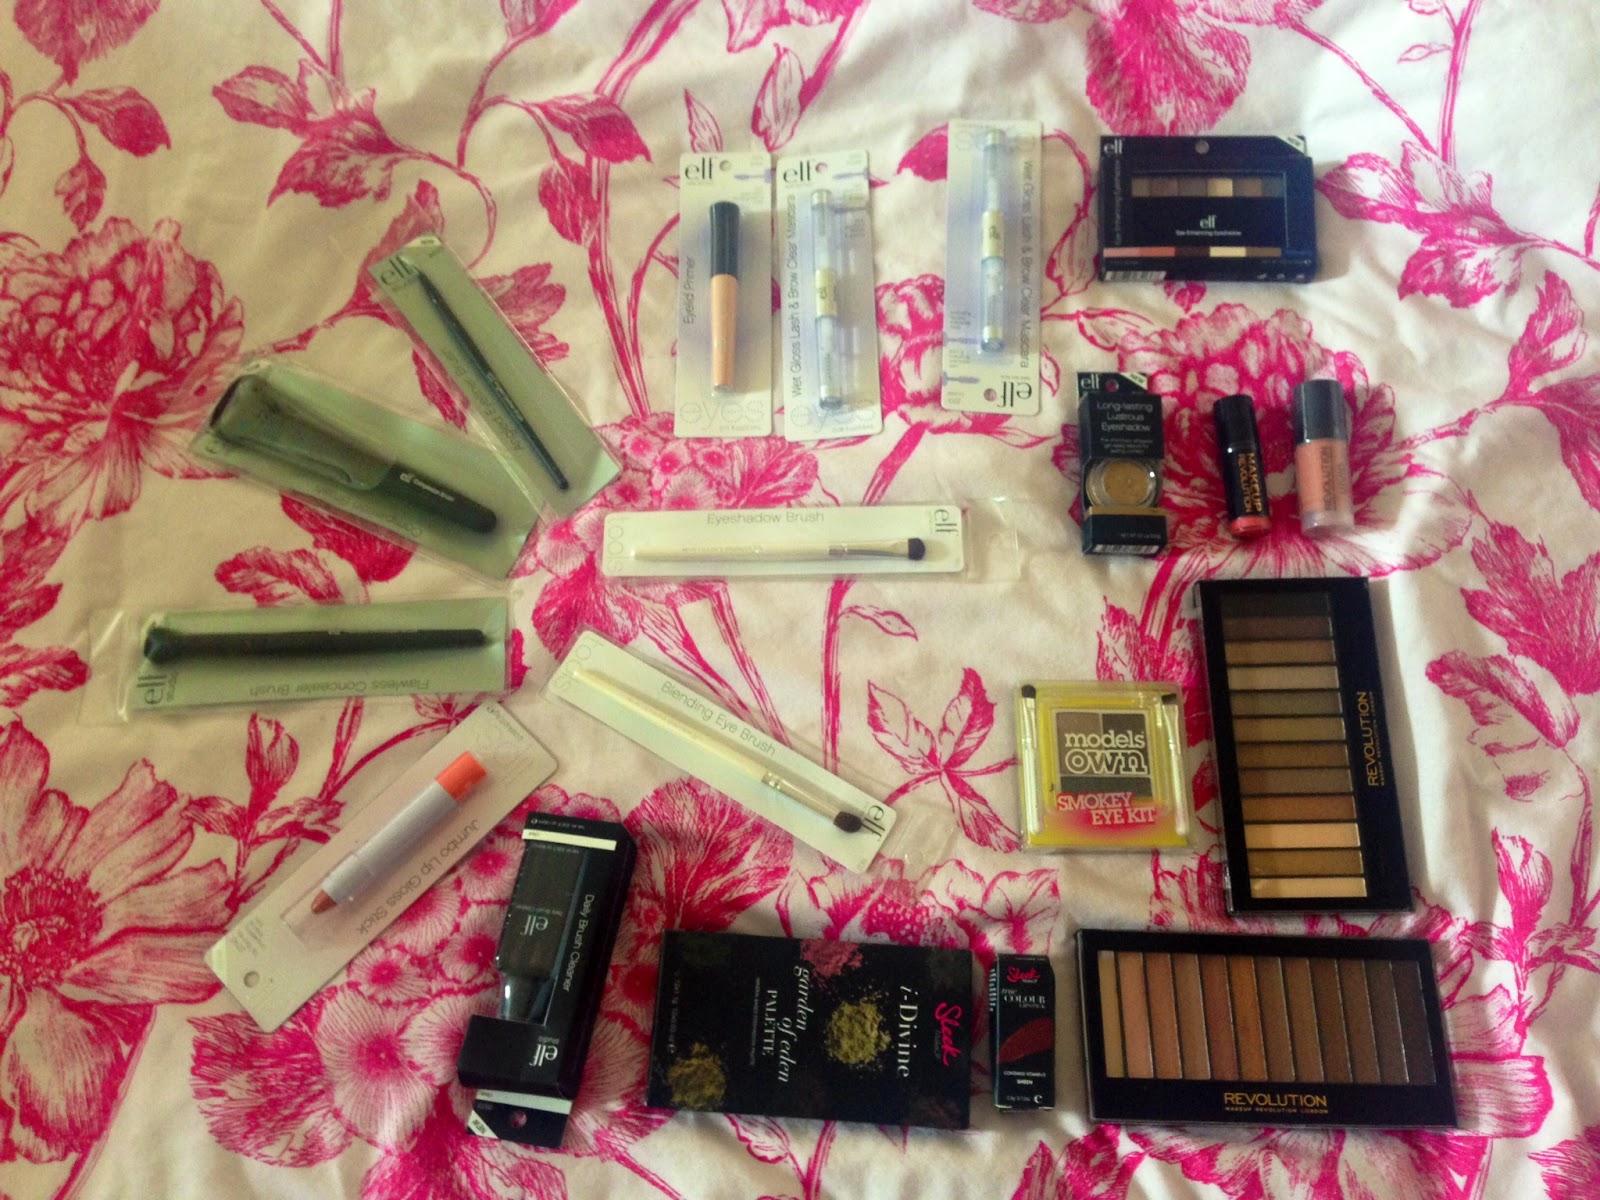 Budget Beauty Haul Makeup Revolution Sleek Elf And Models Own Studio Eye Enhancing Mascara